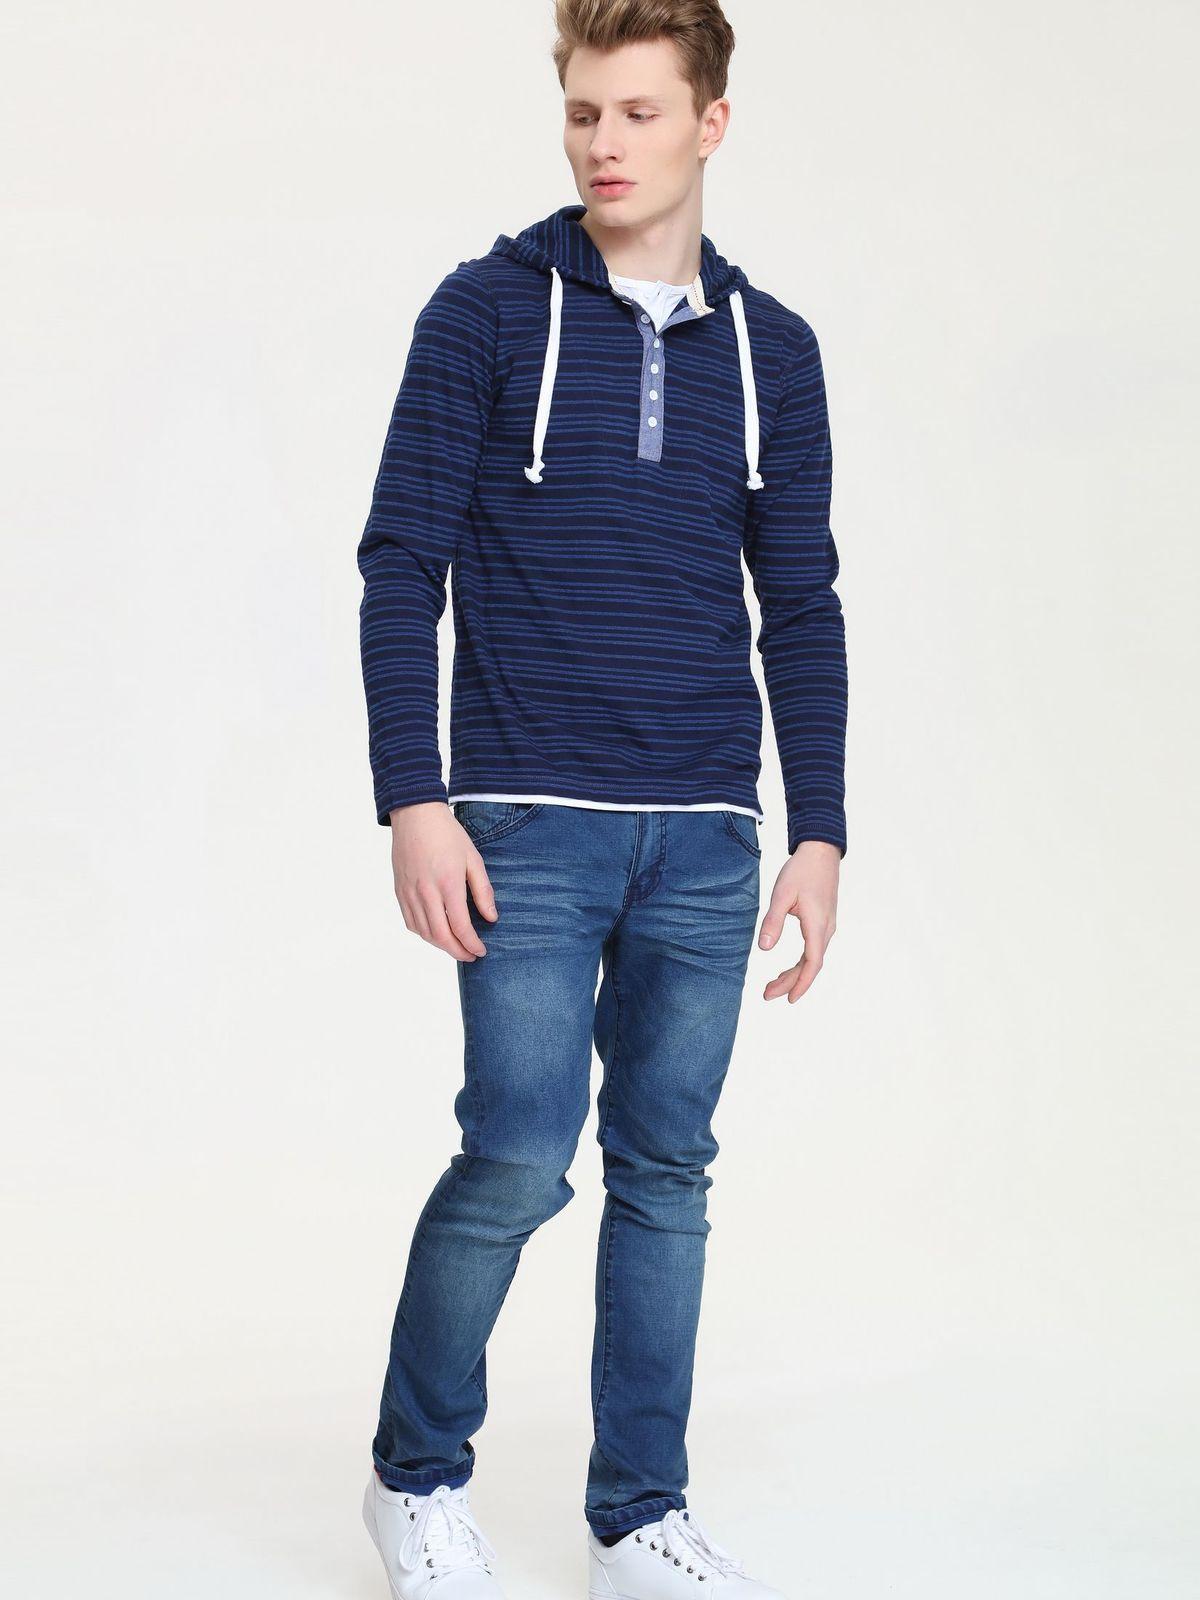 TOP SECRET ανδρικη λεπτη μπλουζα #sales #style #fashion